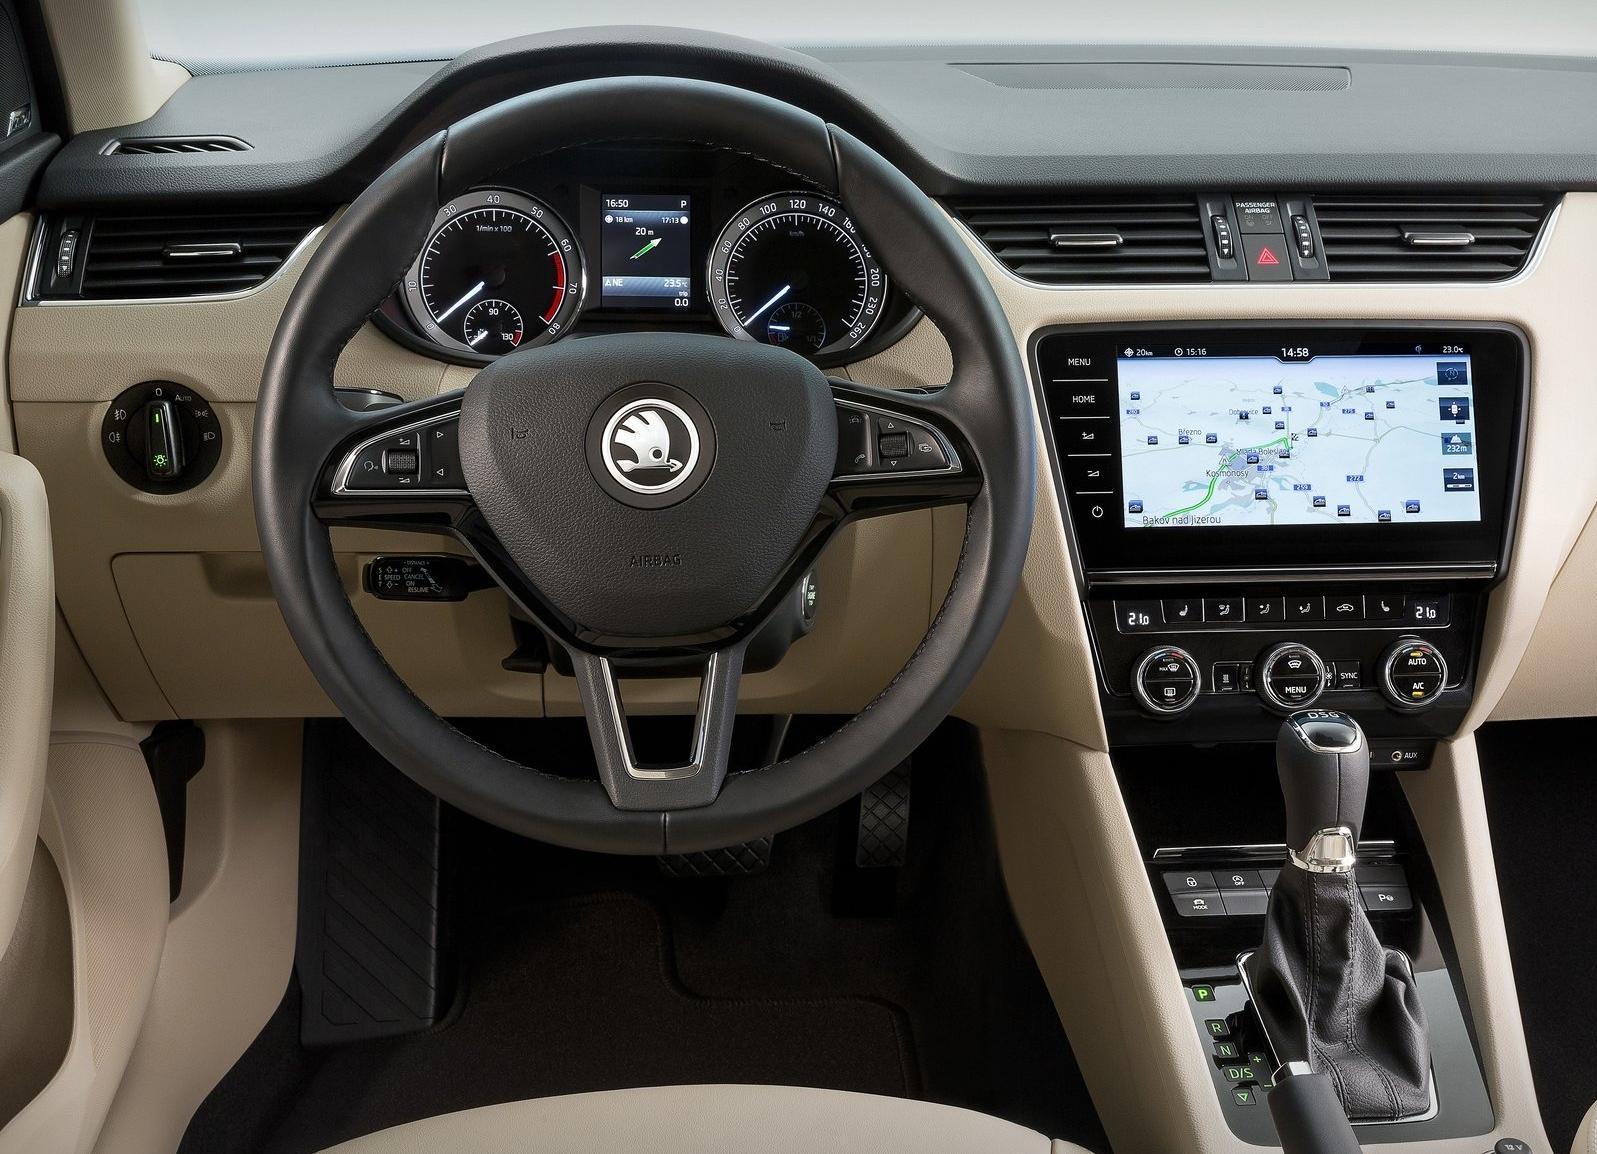 https://www.whatcar.lv/cars/Skoda/Octavia/a4c3463a467bbb4faf1151926e9328ef.jpg